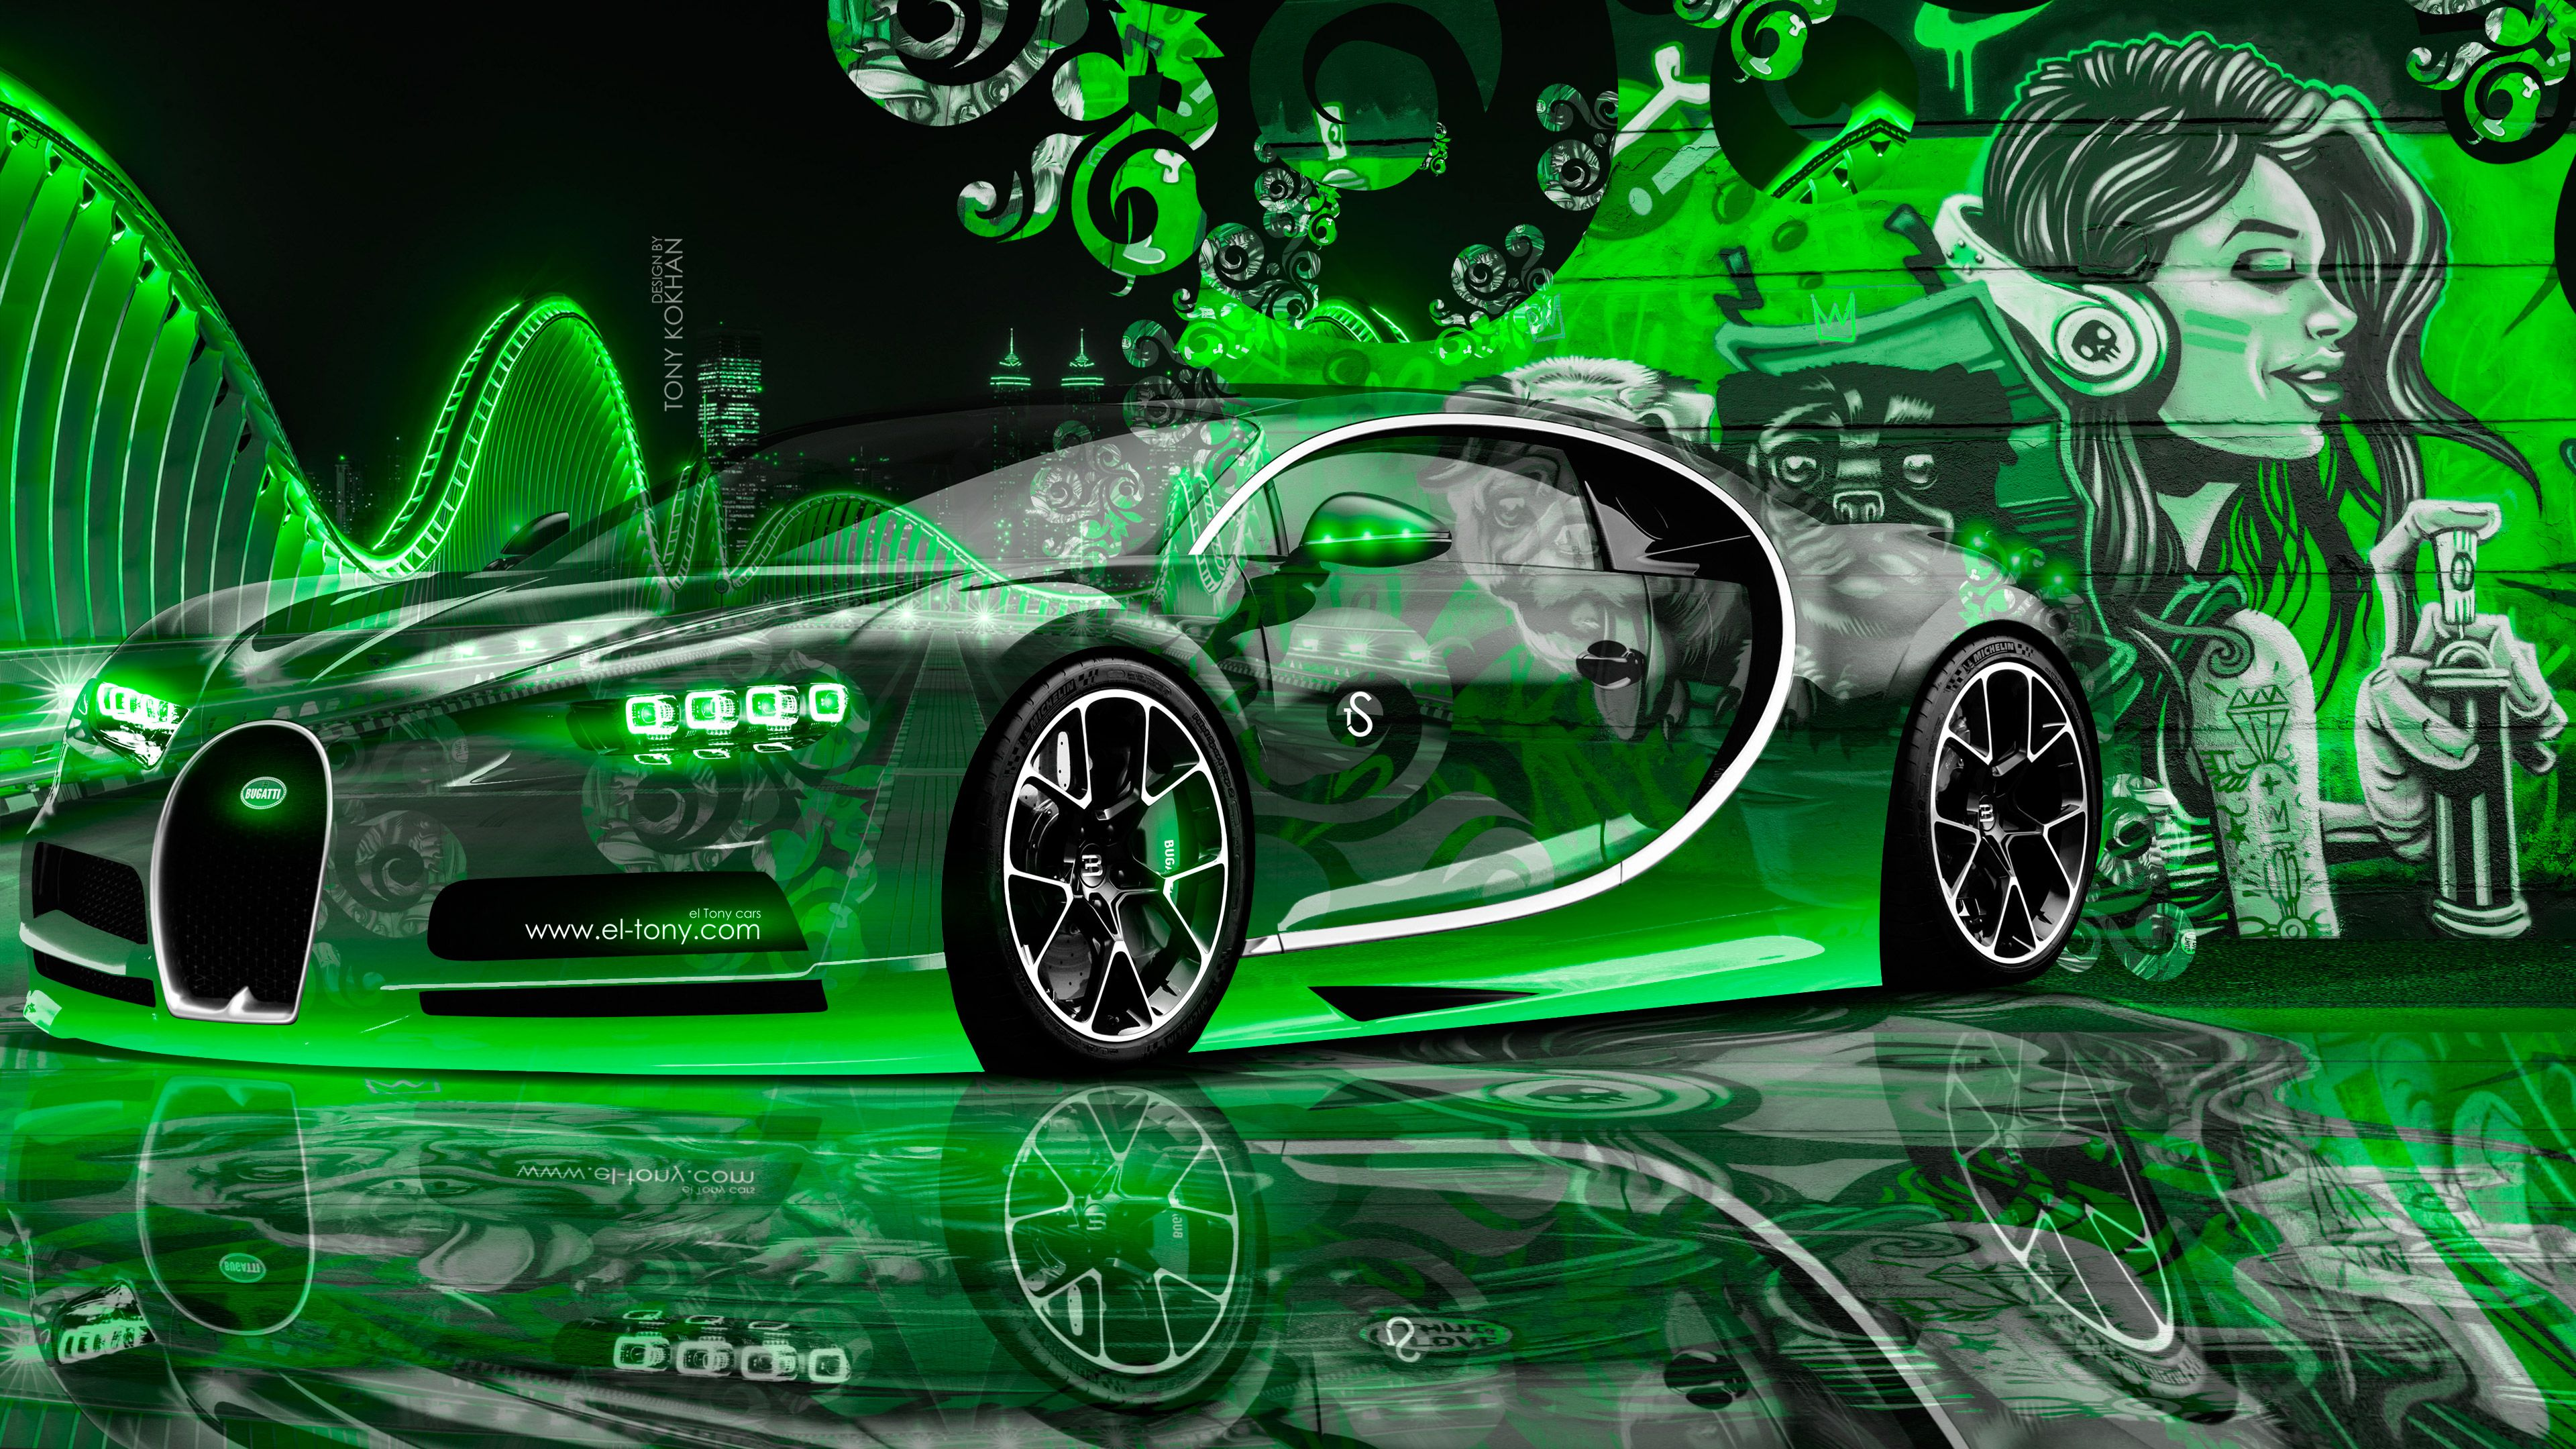 Neon Bugatti Wallpapers - Top Free Neon Bugatti Backgrounds - WallpaperAccess